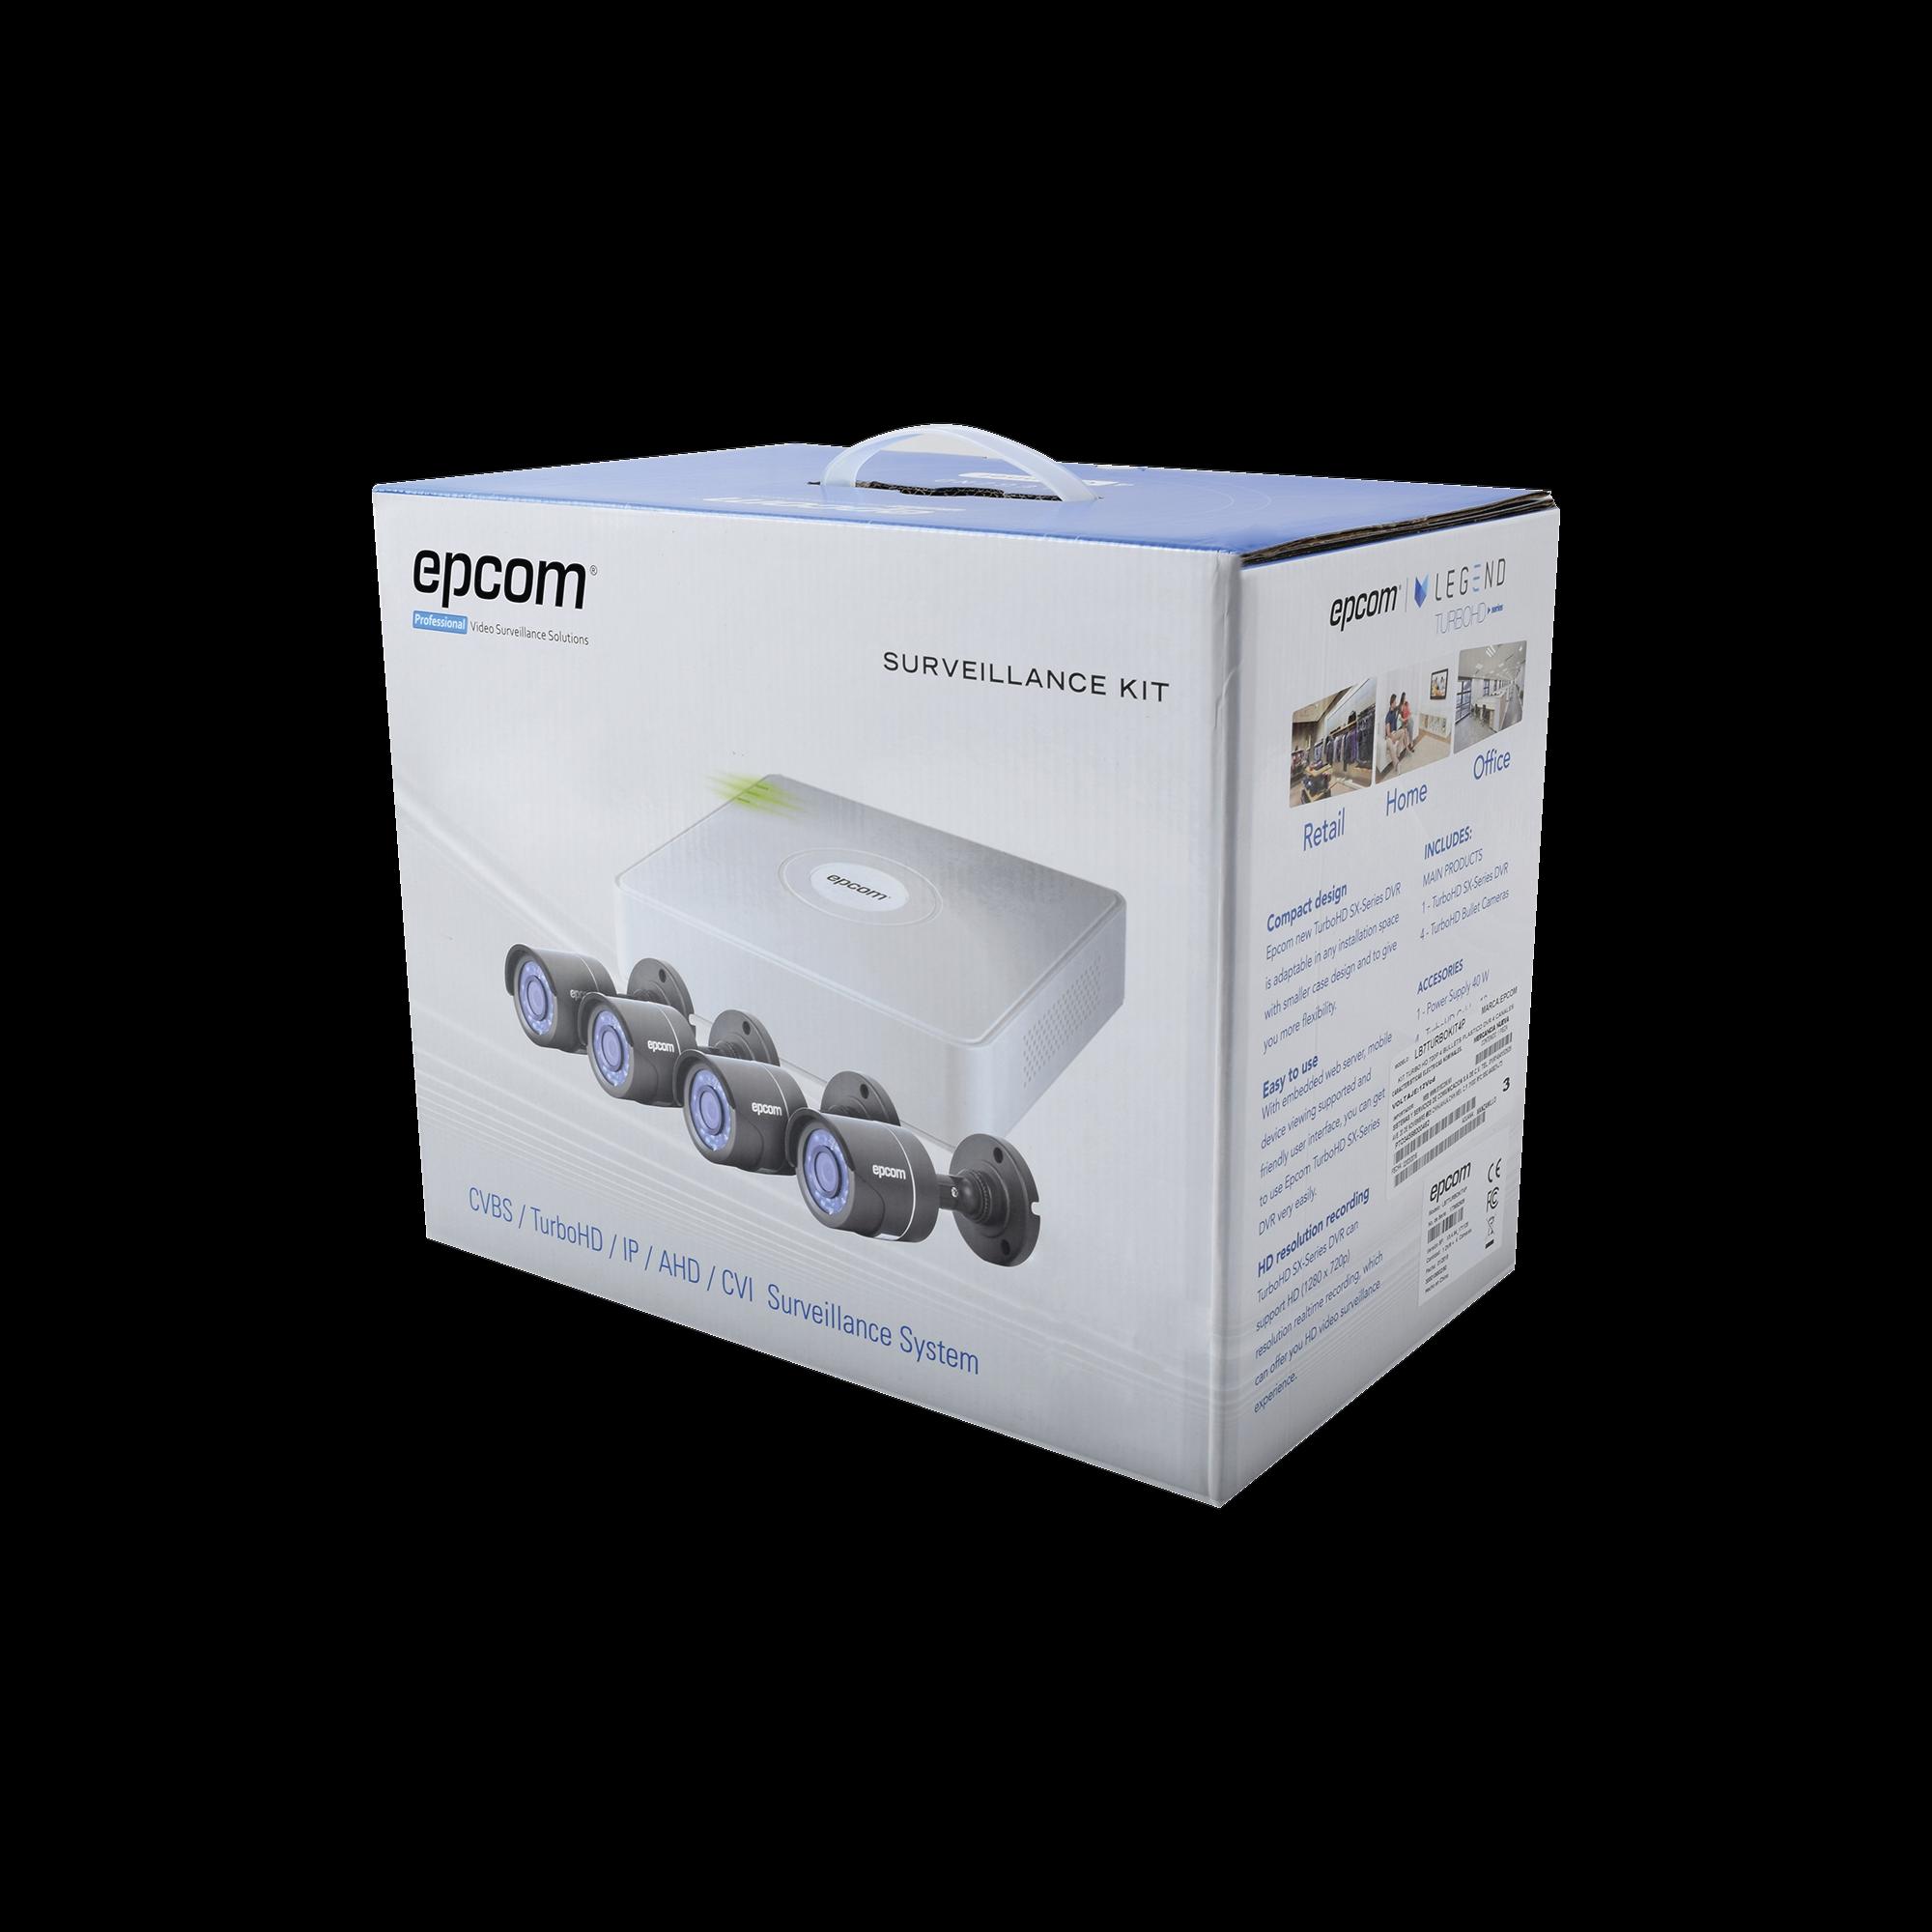 Sistema Completo de CCTV 720p / Hik-Connect / DVR 4 Canales / 4 Cámaras Bala / Cables / Fuente de Poder Profesional